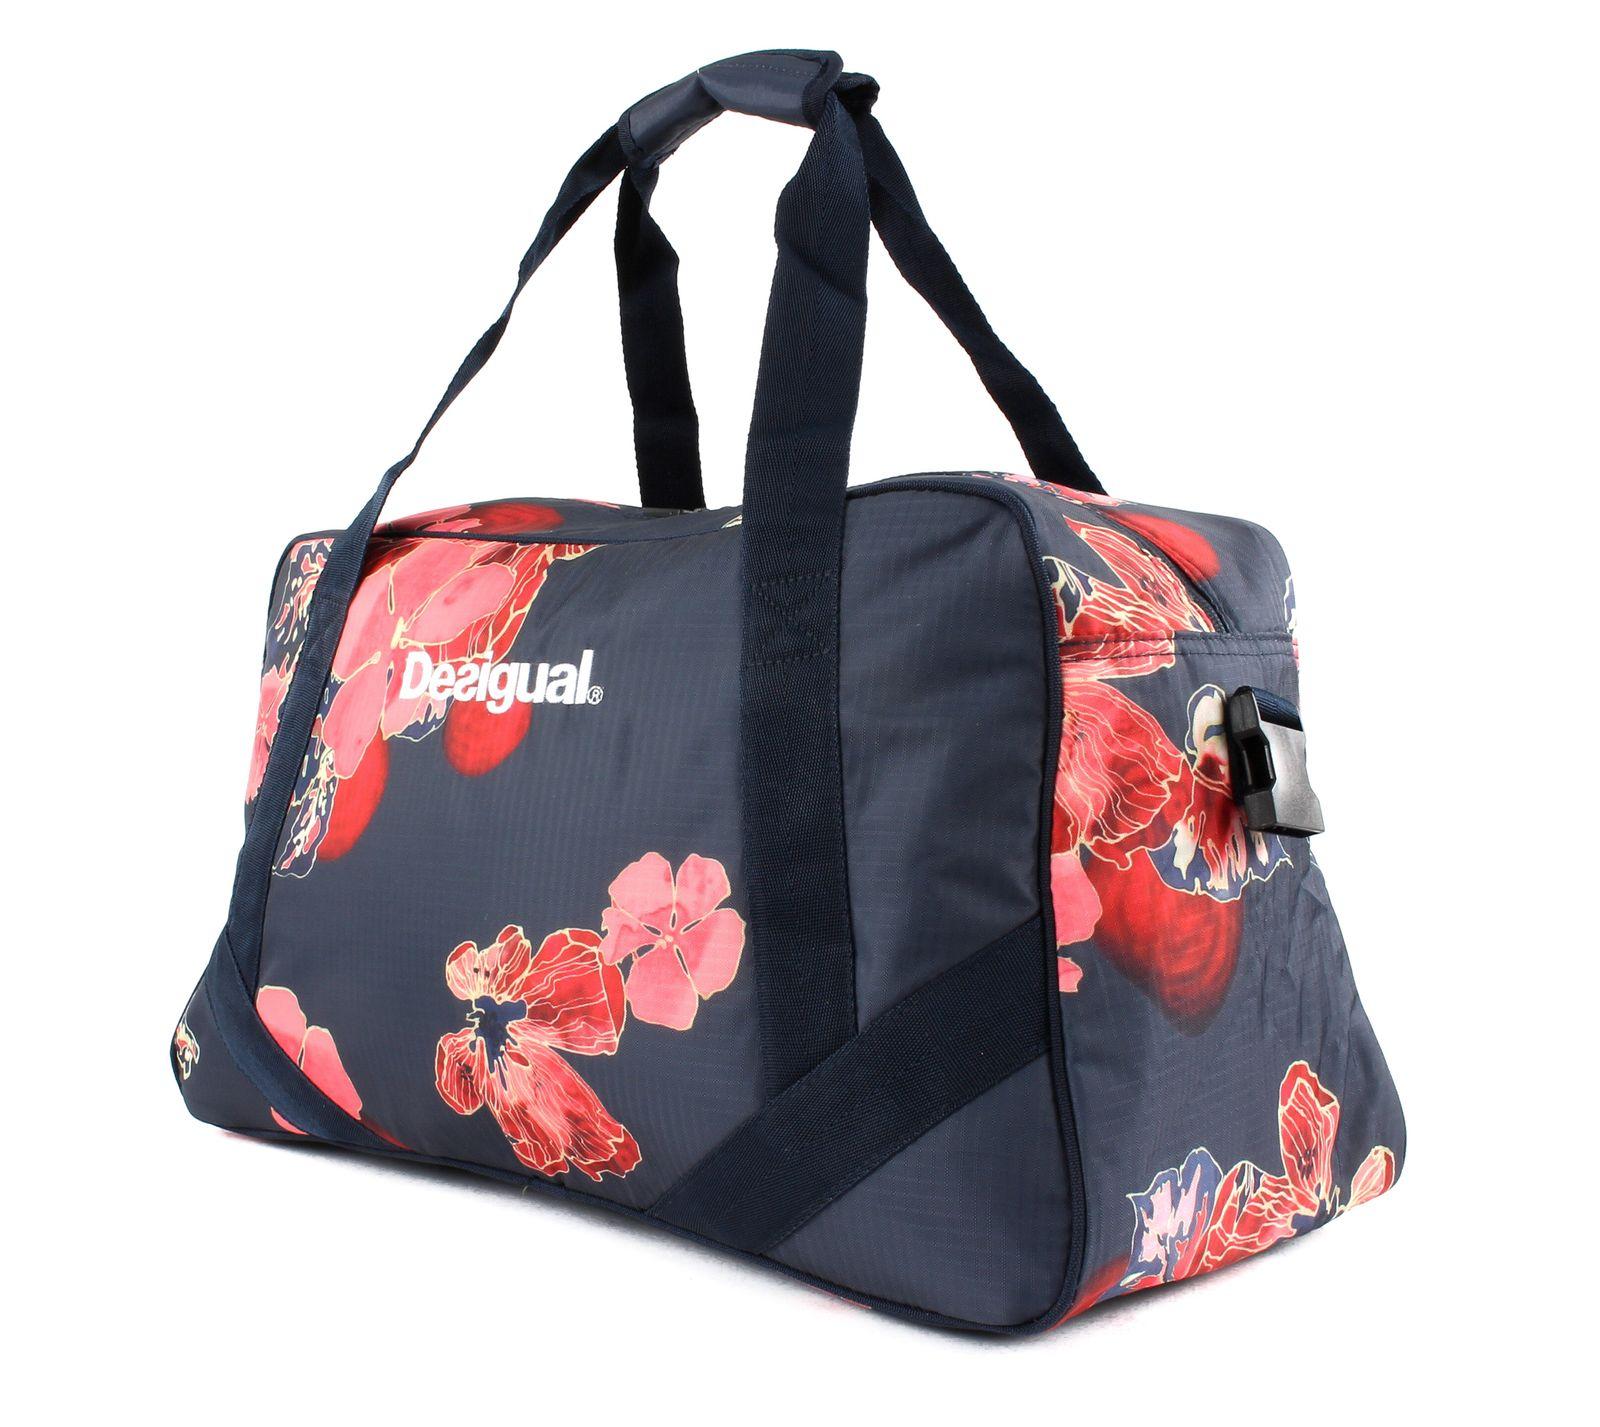 Desigual Scarlet Bloom Carry Shoulder Bag Sporttasche Tasche Peacoat